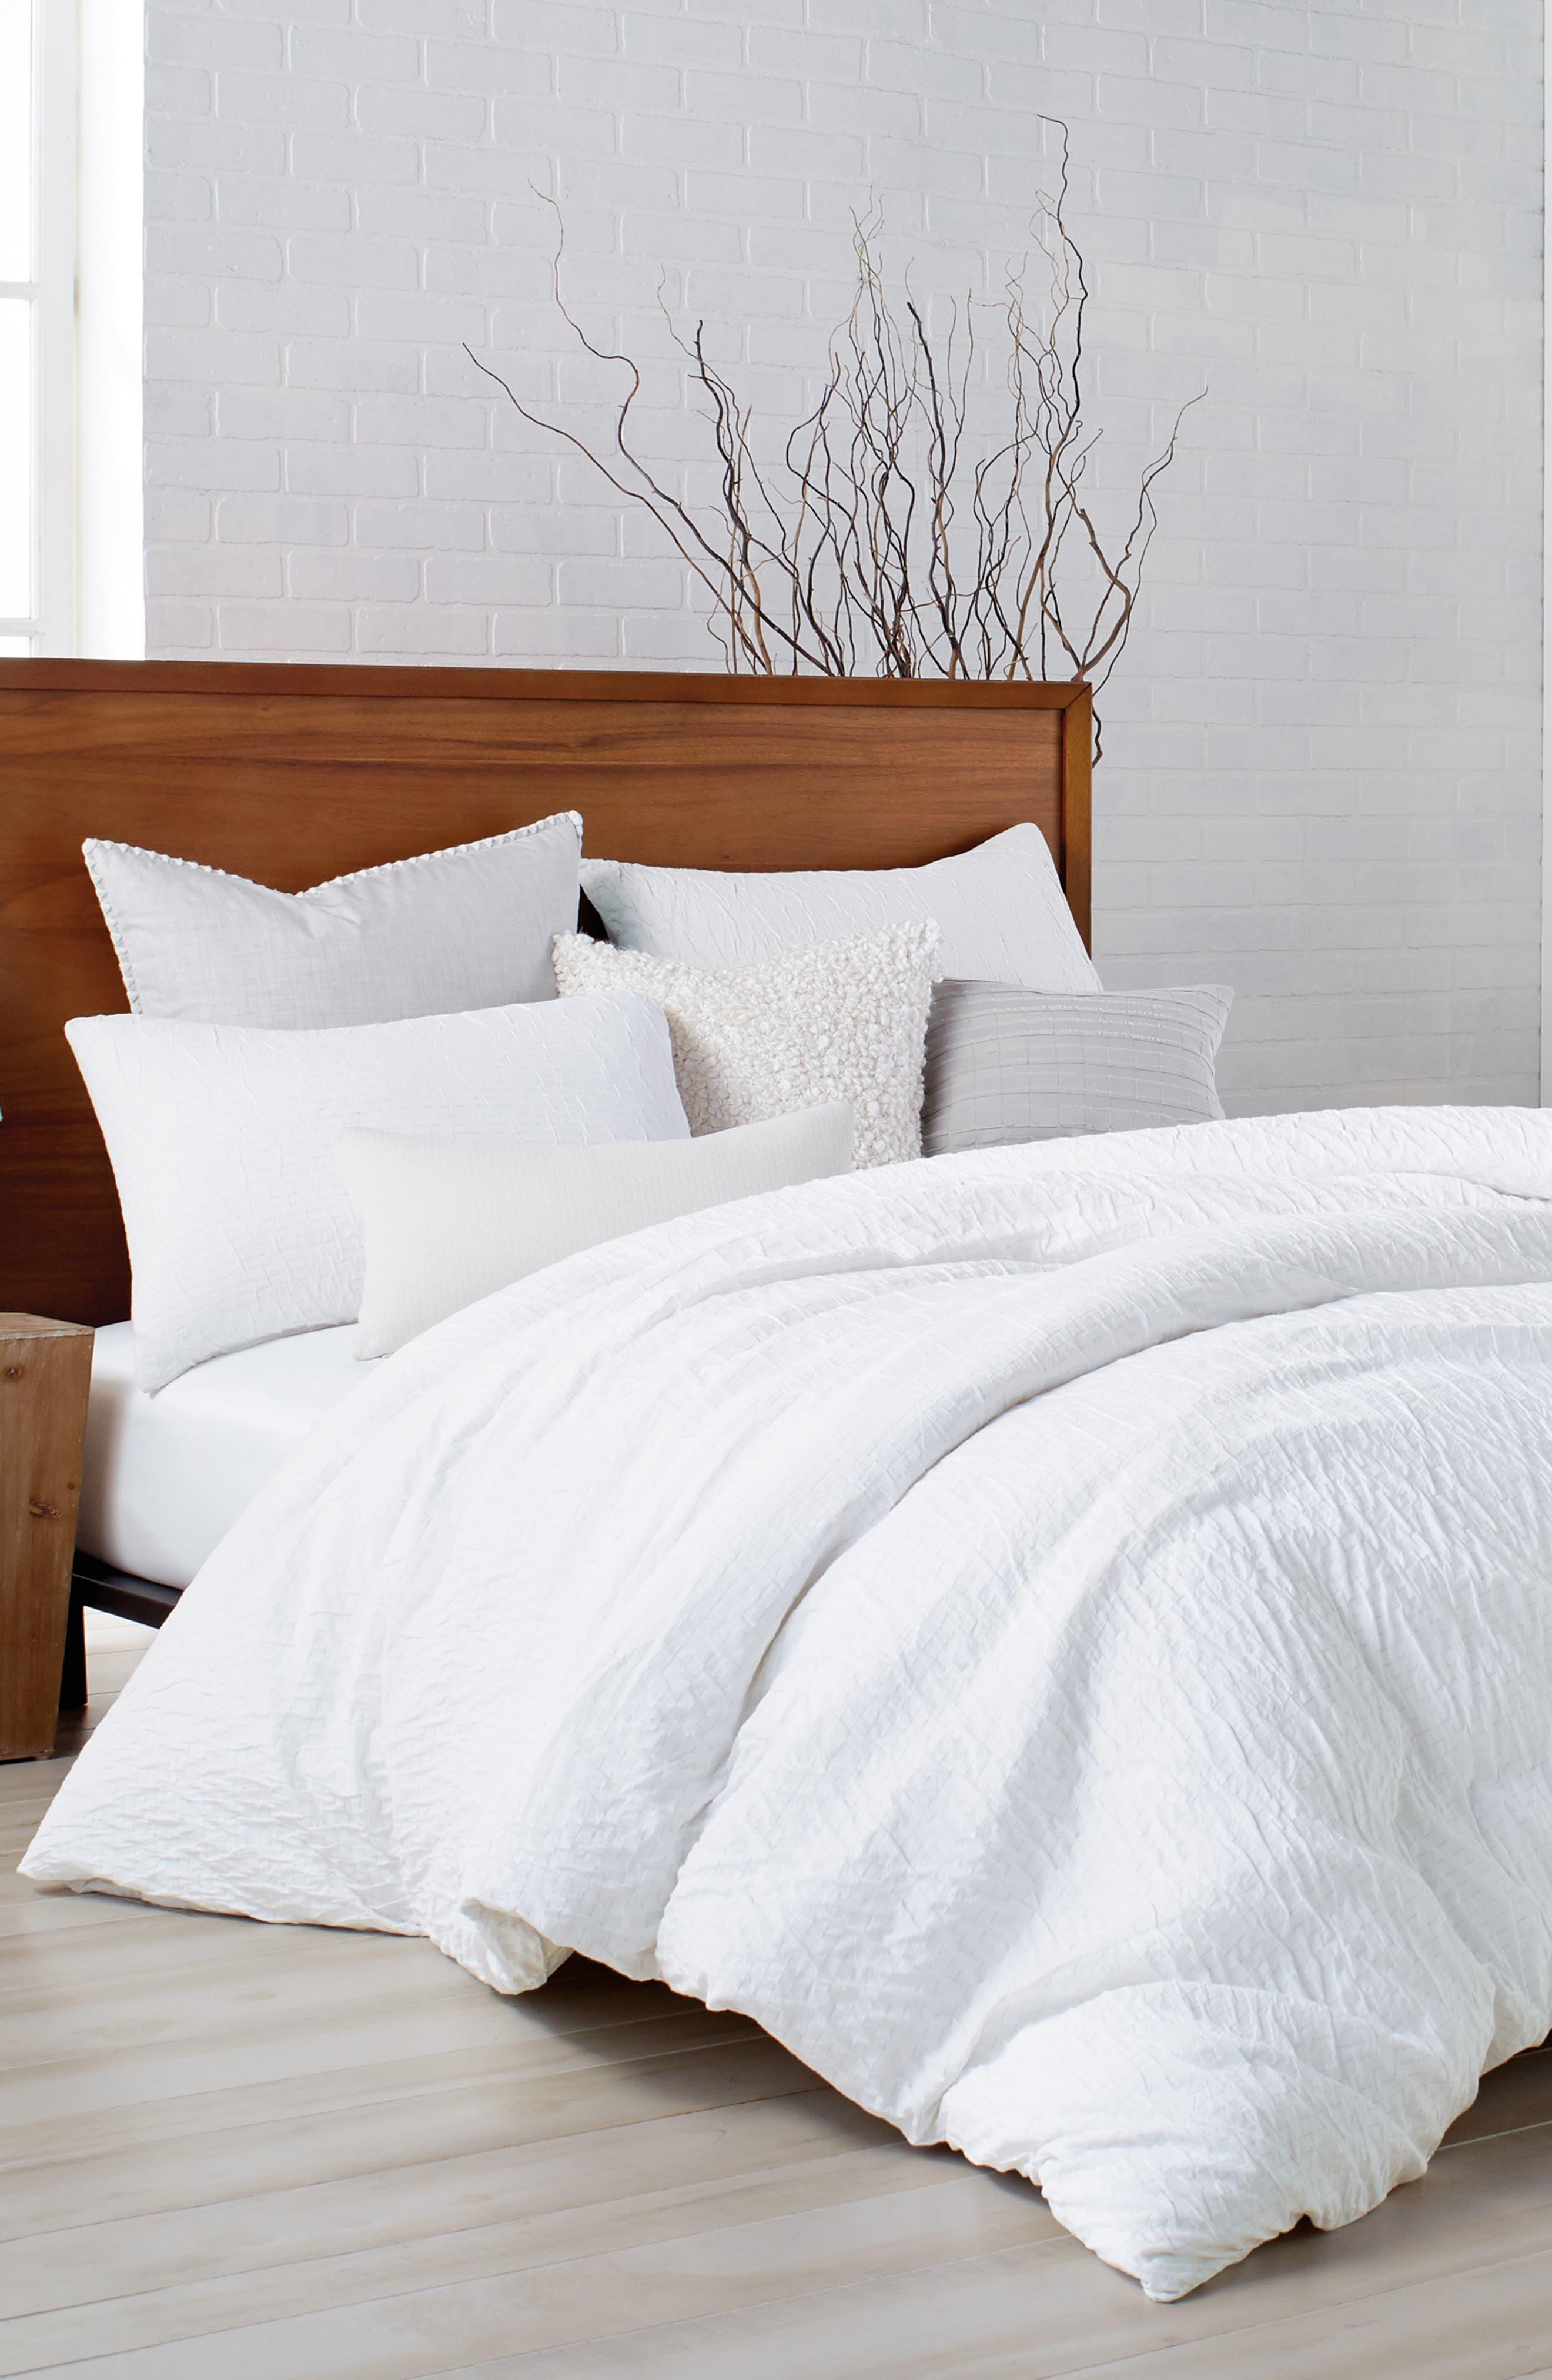 PURE Crinkle Duvet Cover,                             Main thumbnail 1, color,                             WHITE